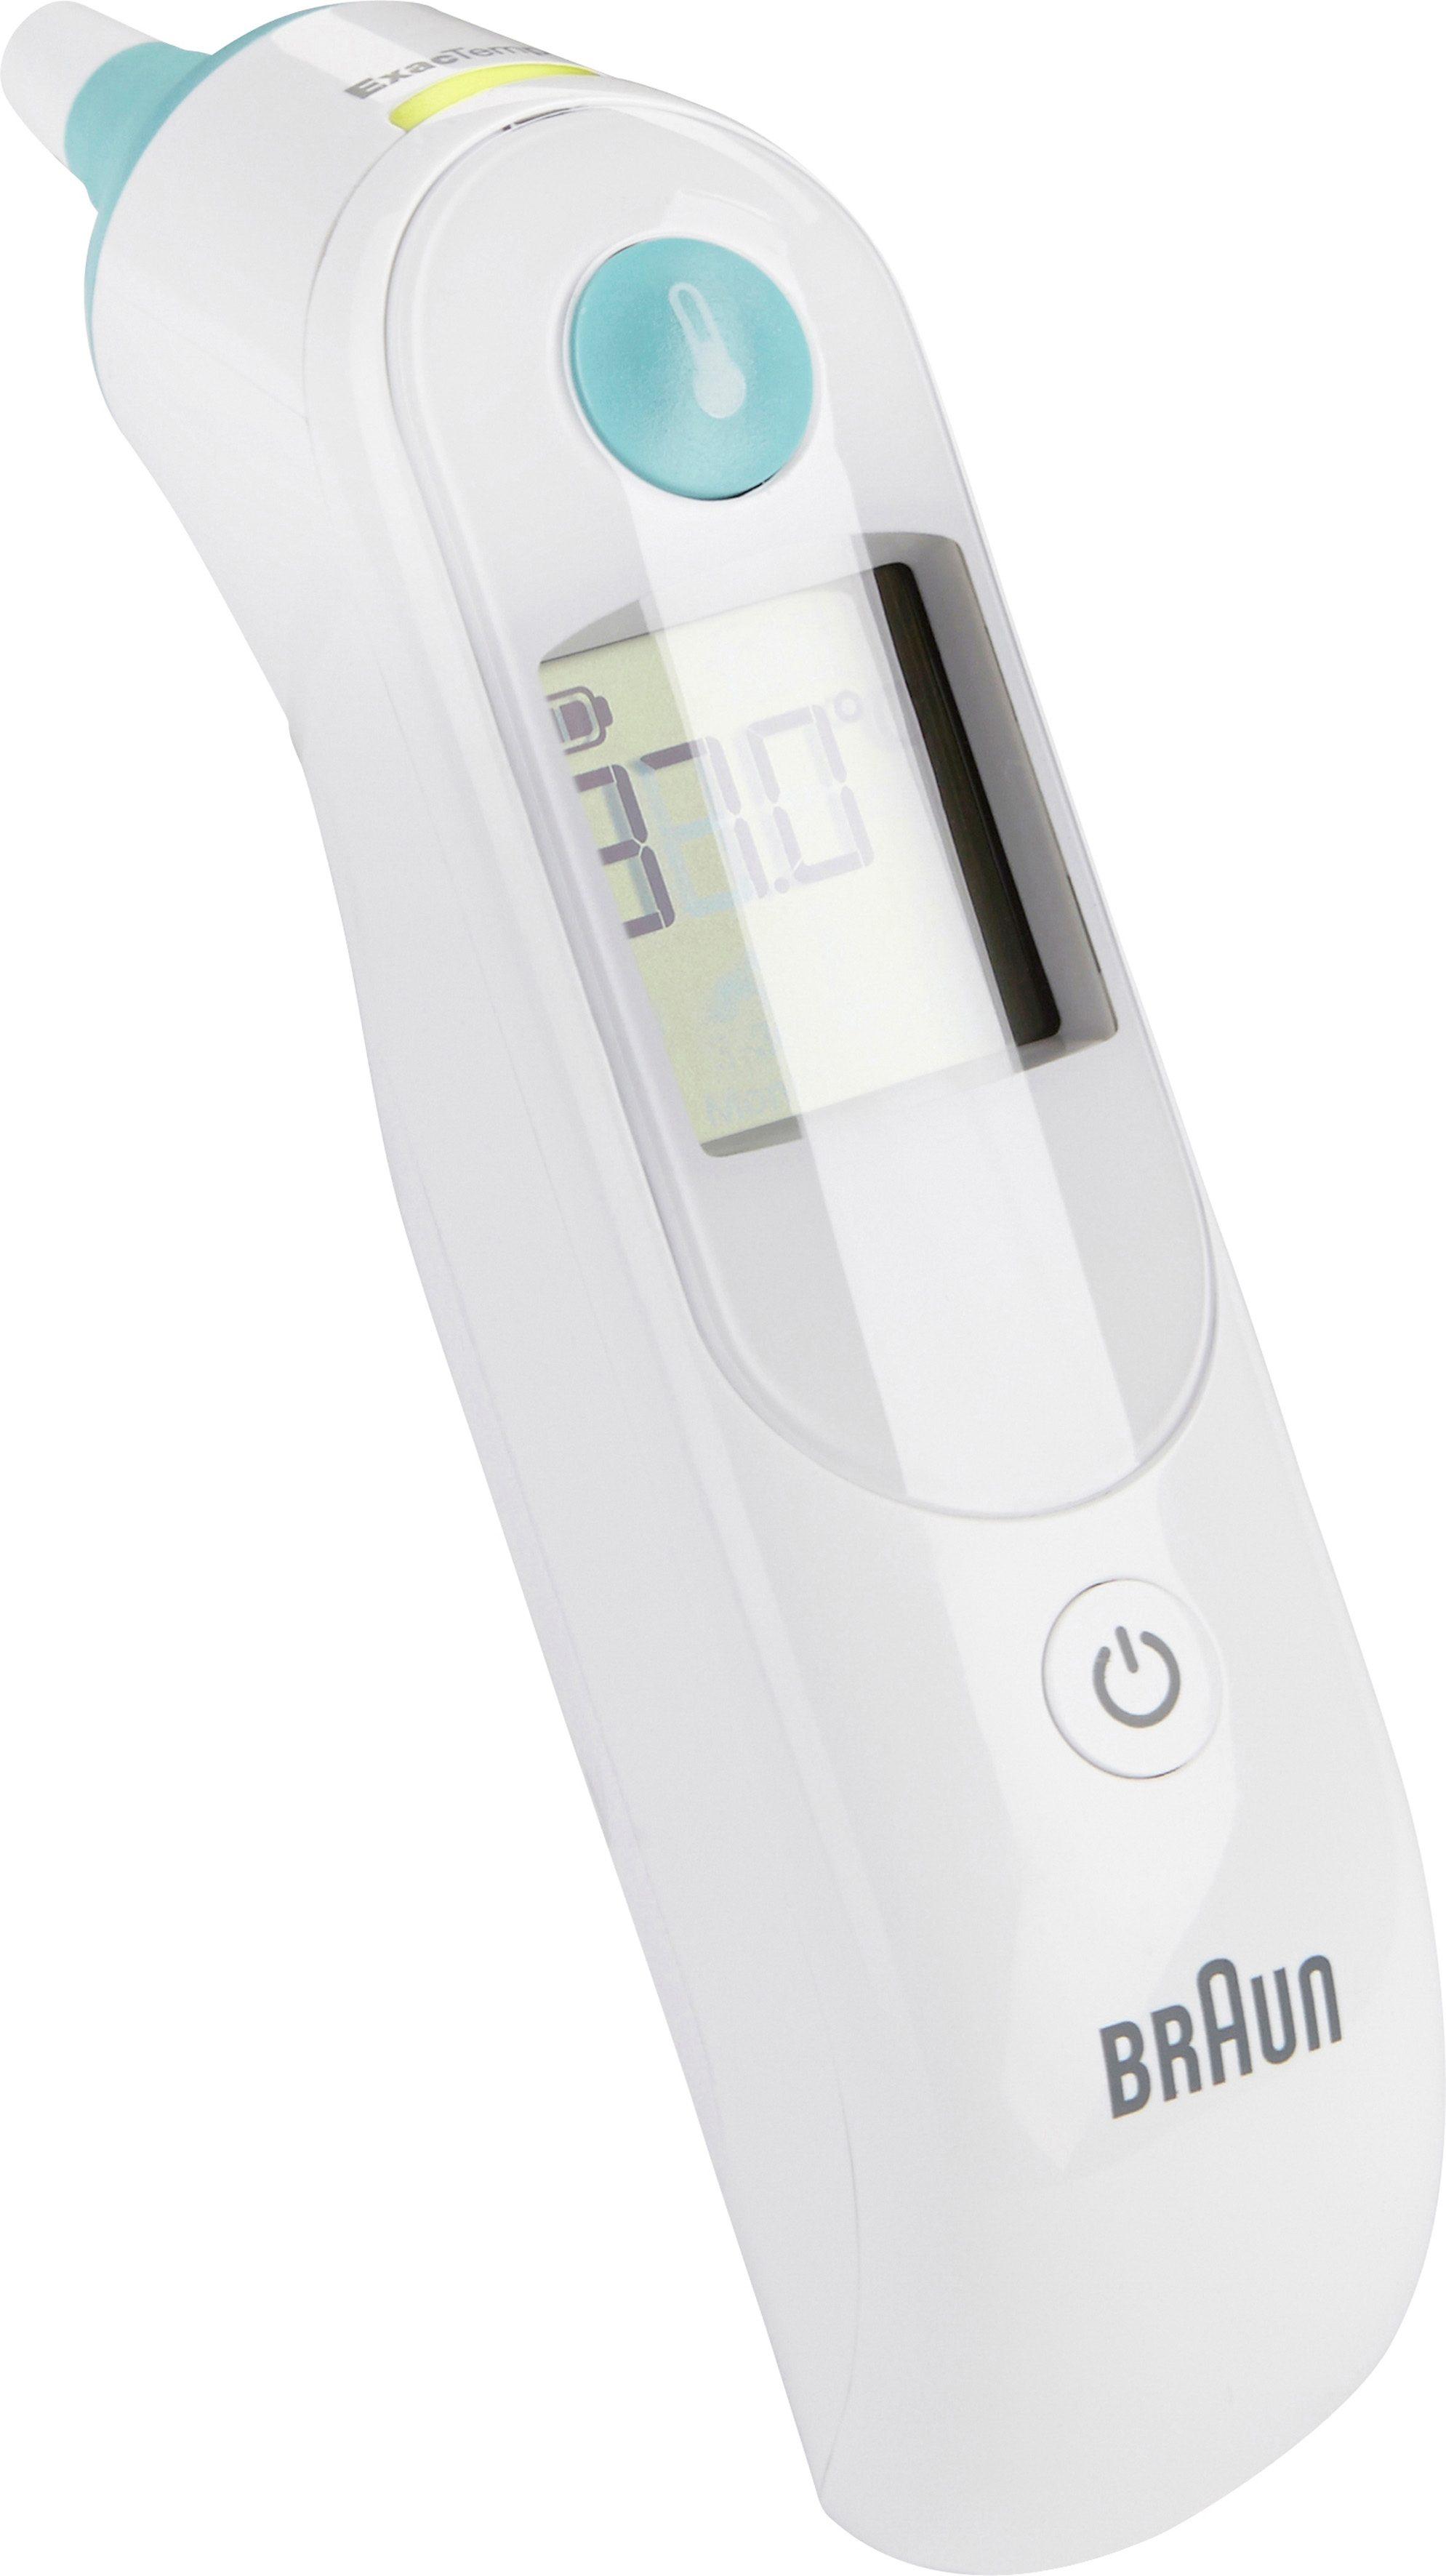 Braun Fieberthermometer ThermoScan 5 IRT6020